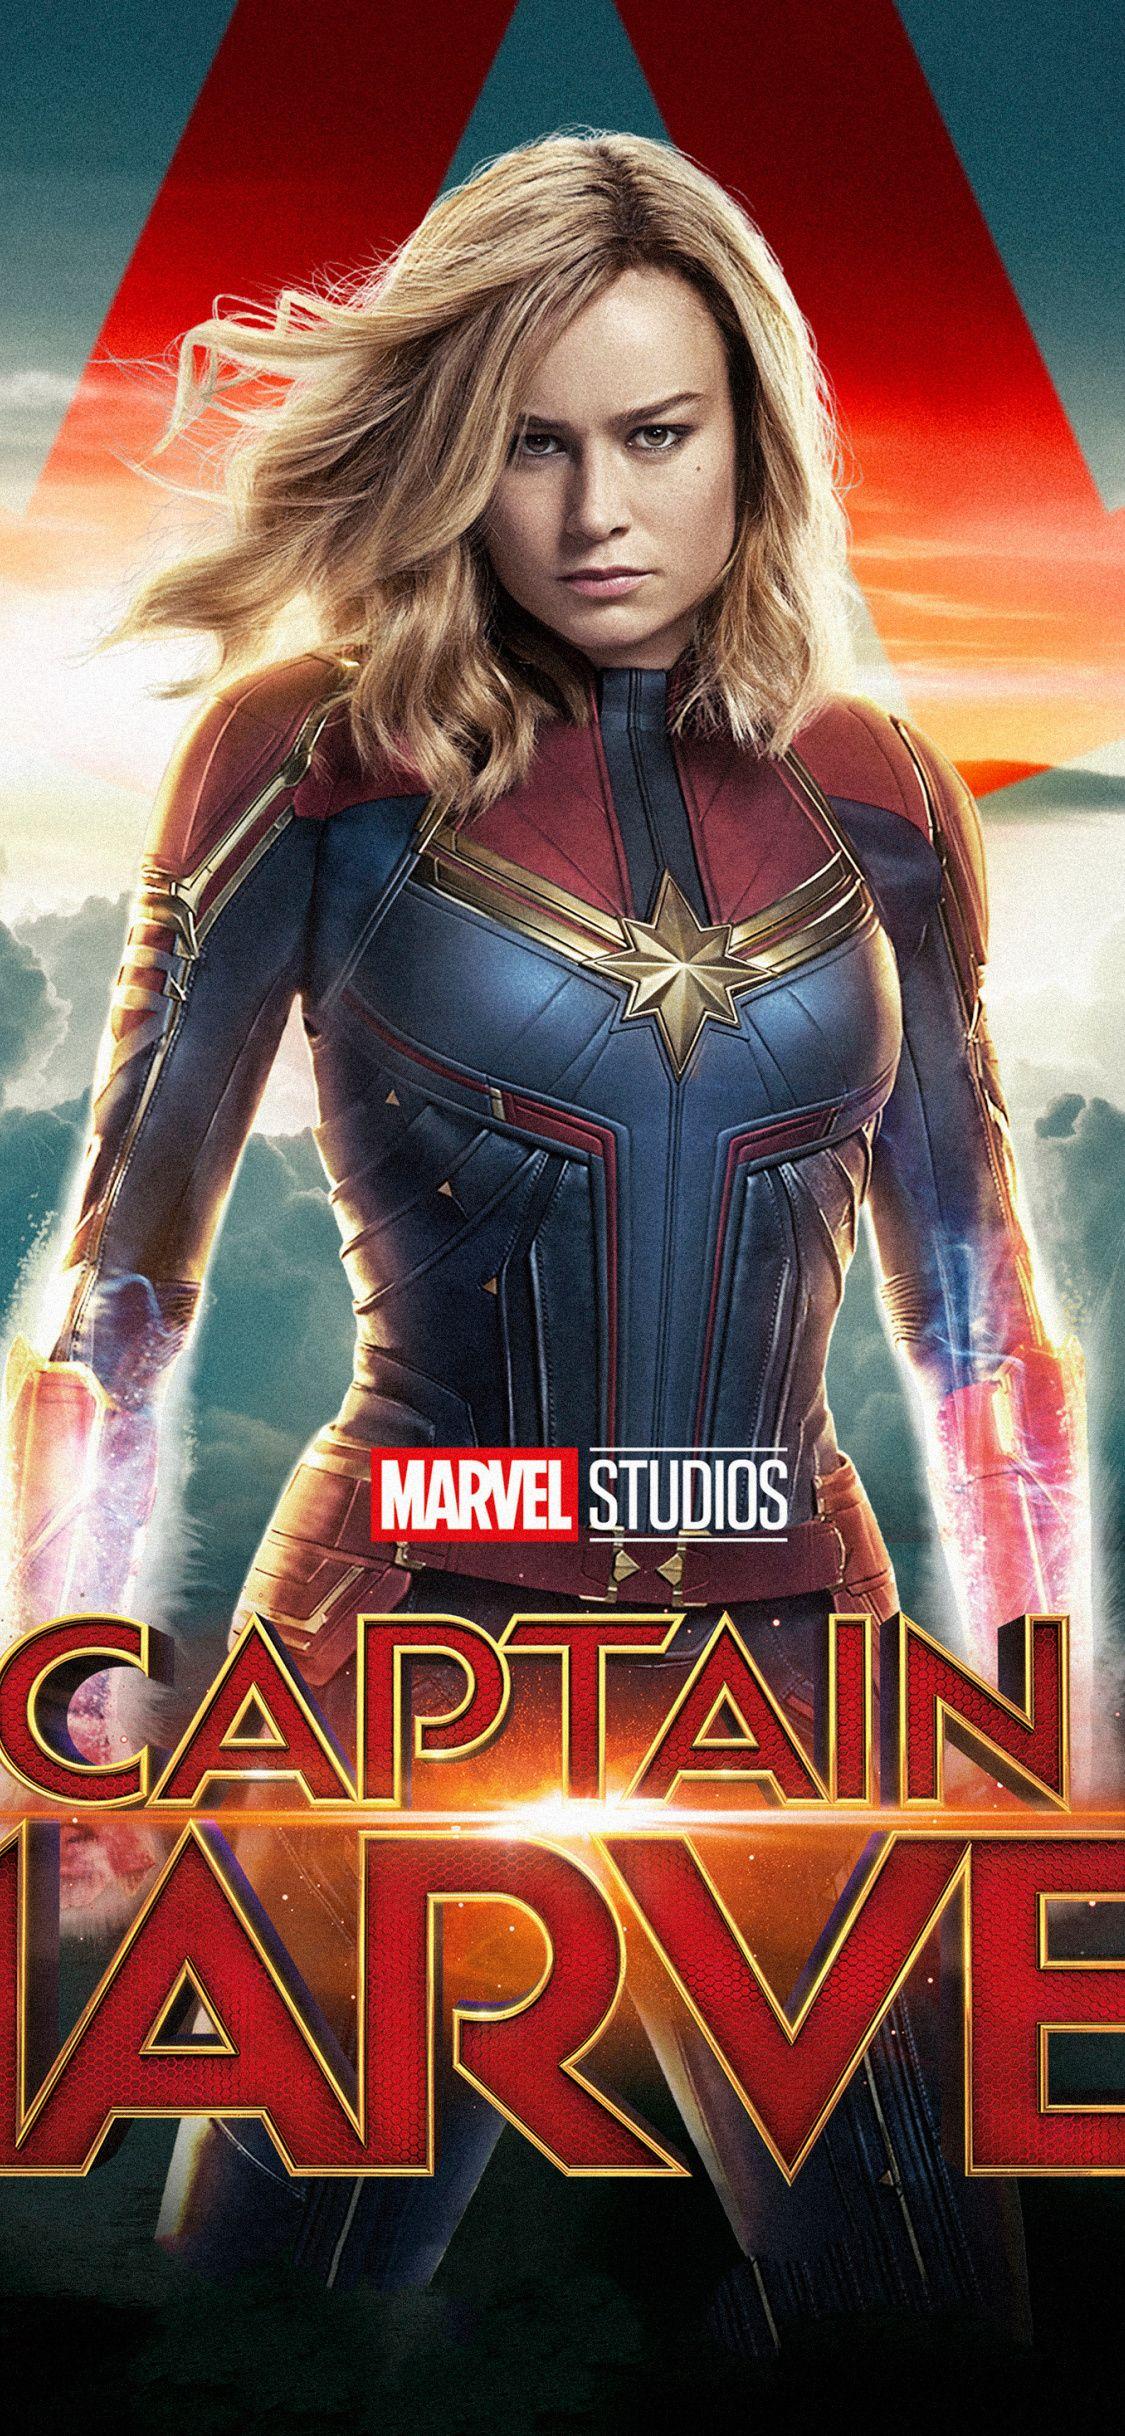 Download 1125x2436 Wallpaper Movie Superhero Actress Captain Marvel Iphone X 1125x2436 Hd Image Background Marvel Heroines Captain Marvel Marvel Posters